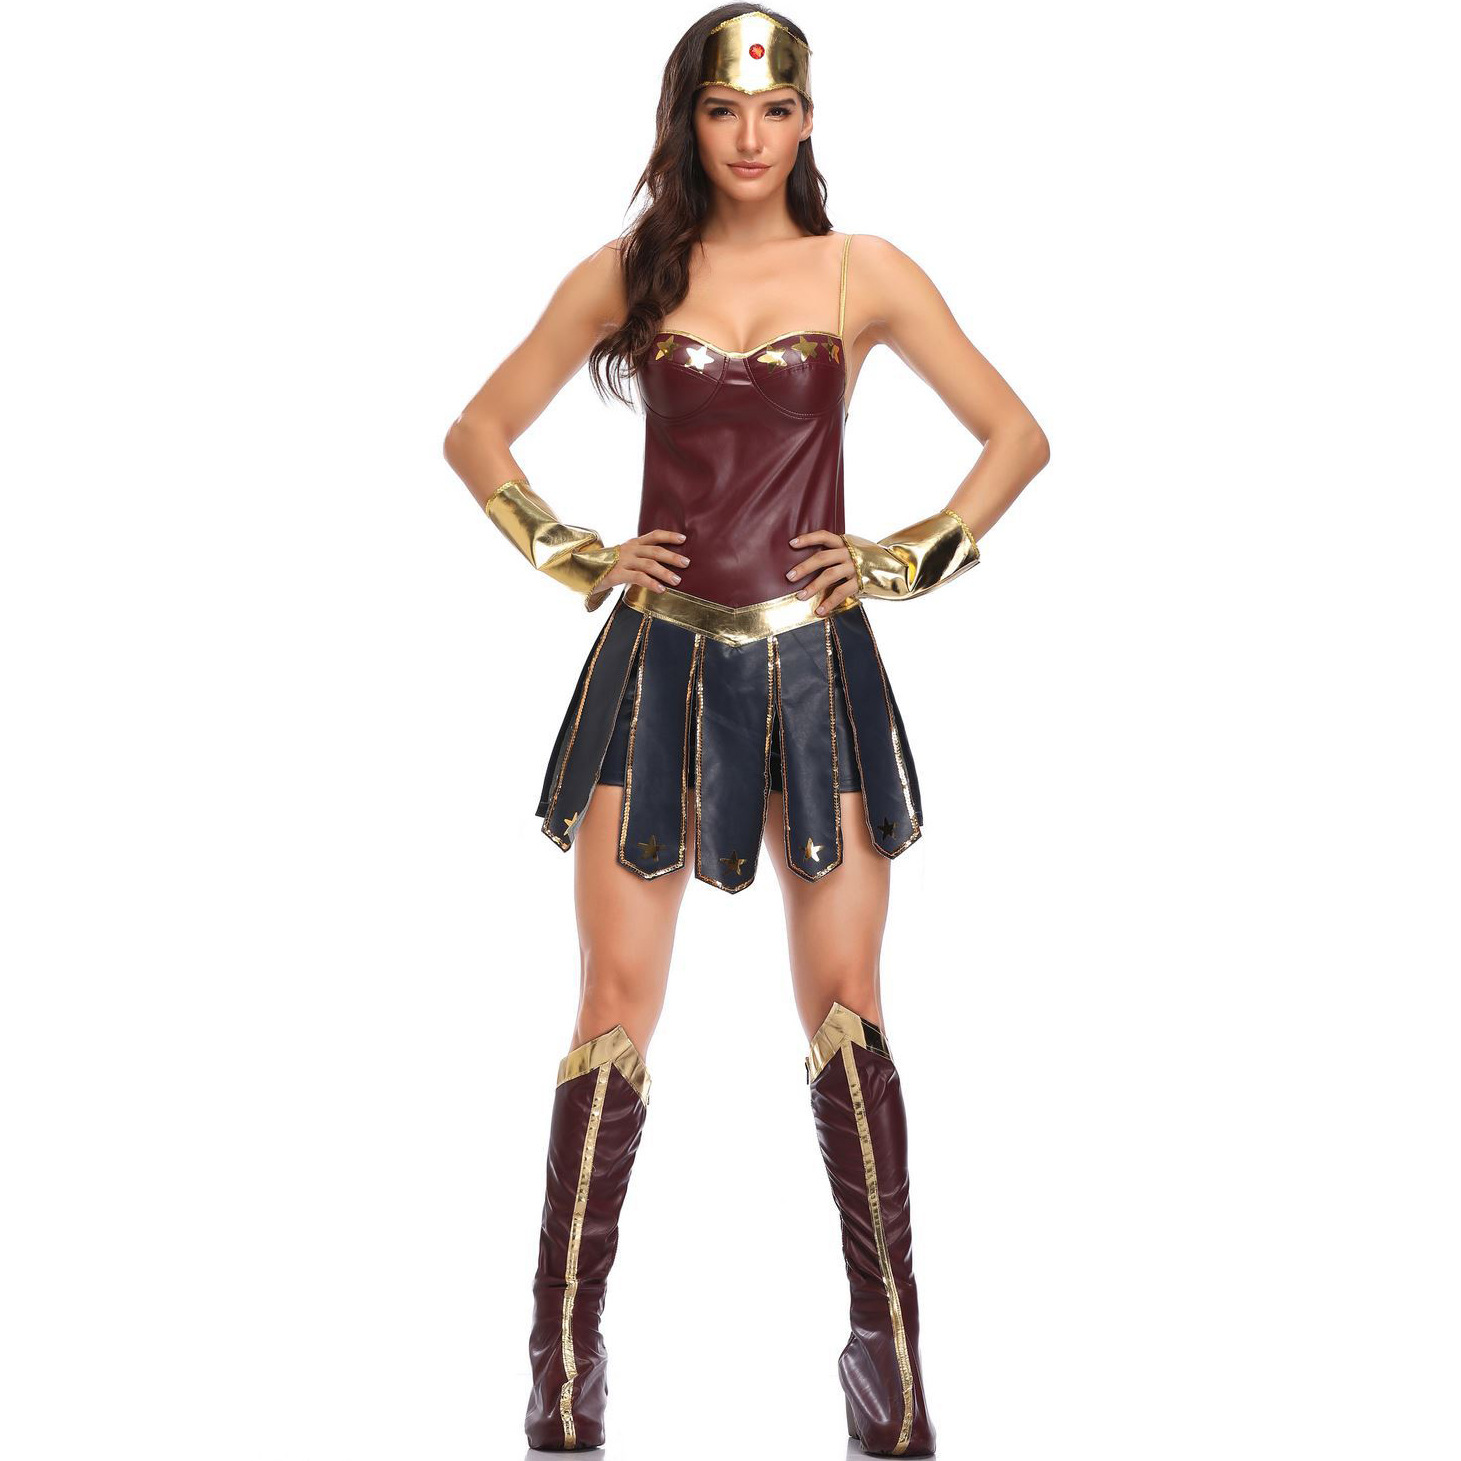 Justice League Superhero Wonder Woman Diana Prince Female Cosplay Costume, Halloween Game Sexy Adult Women Apparel